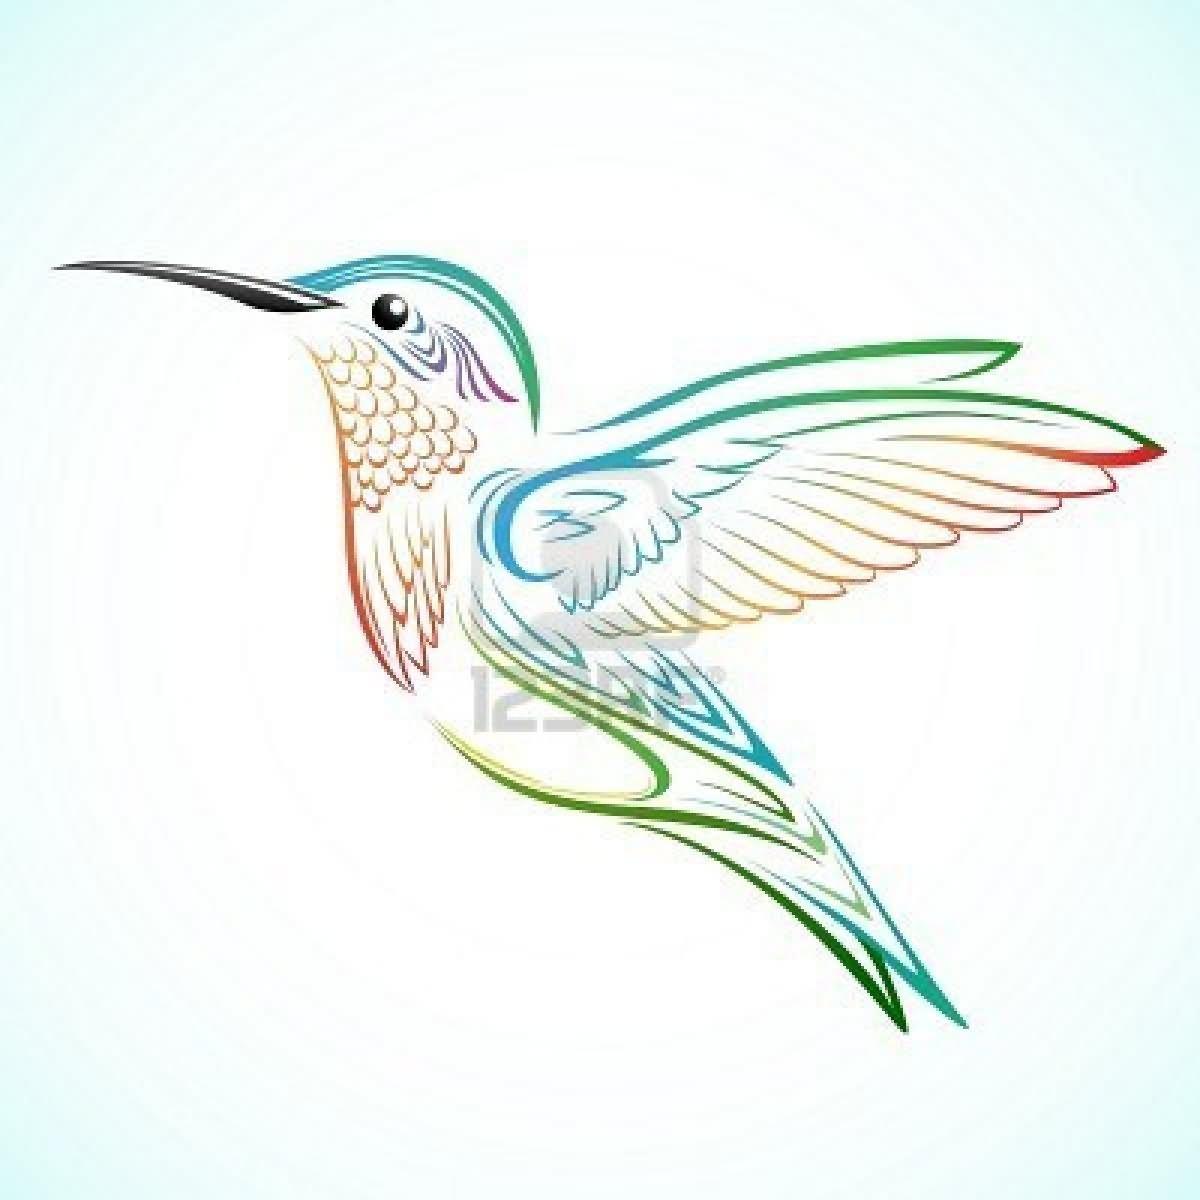 38 hummingbird designs and ideas